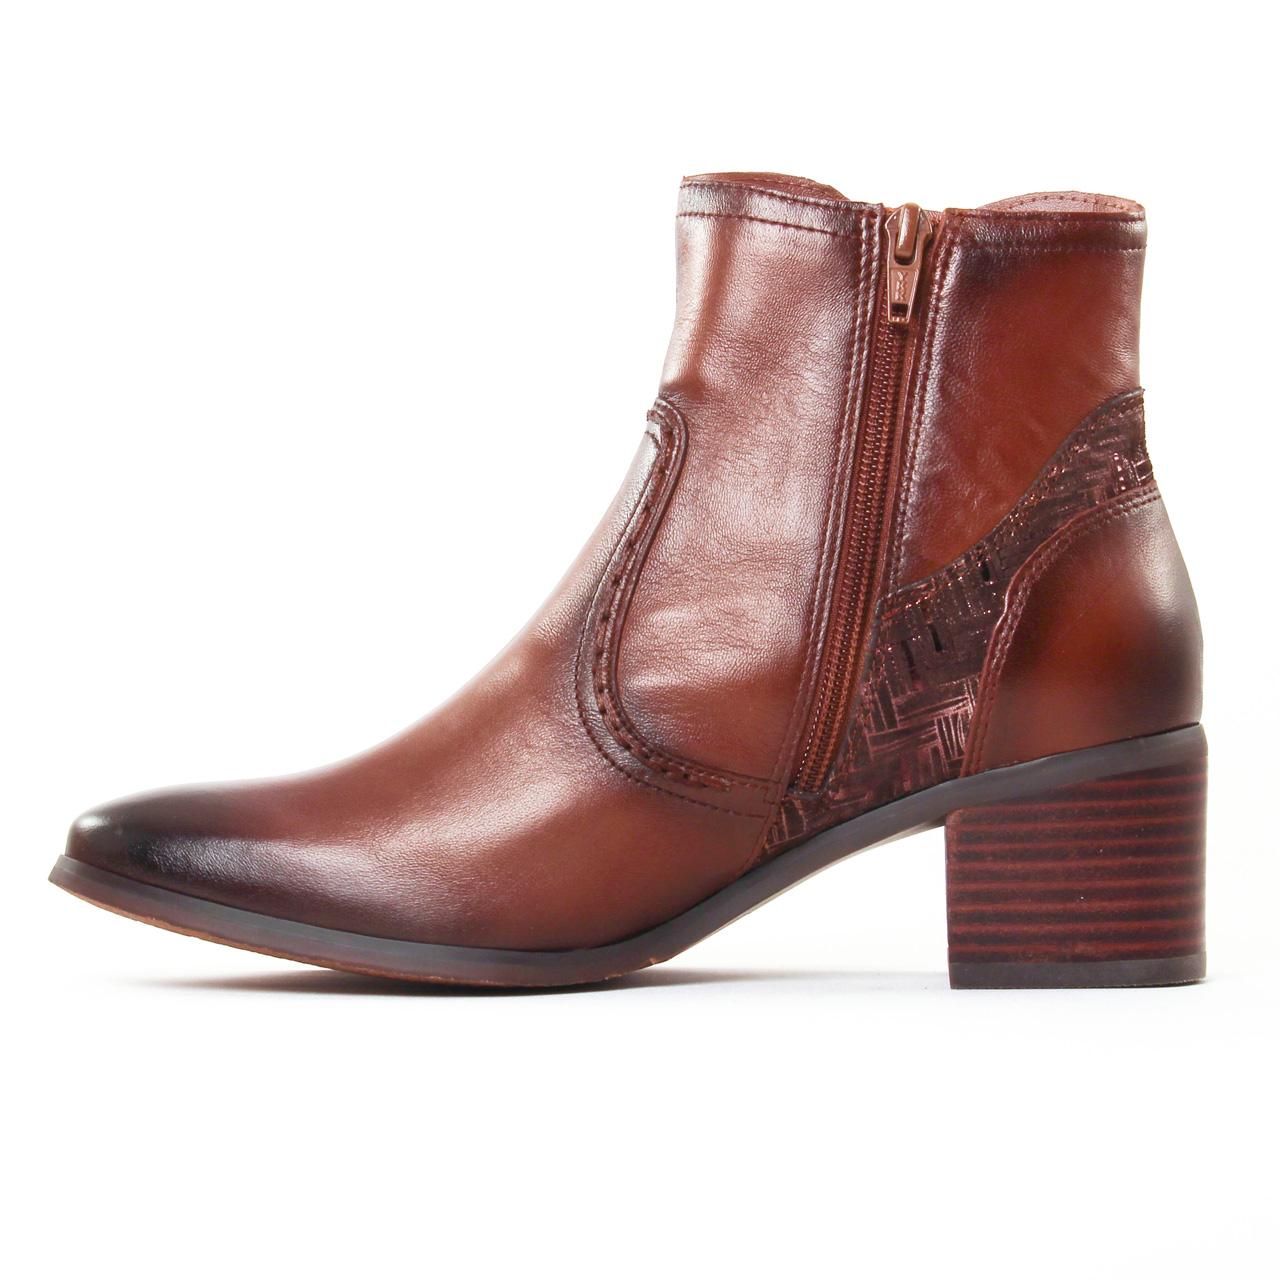 fugitive laino nappa gold | boot talon marron automne hiver 2017